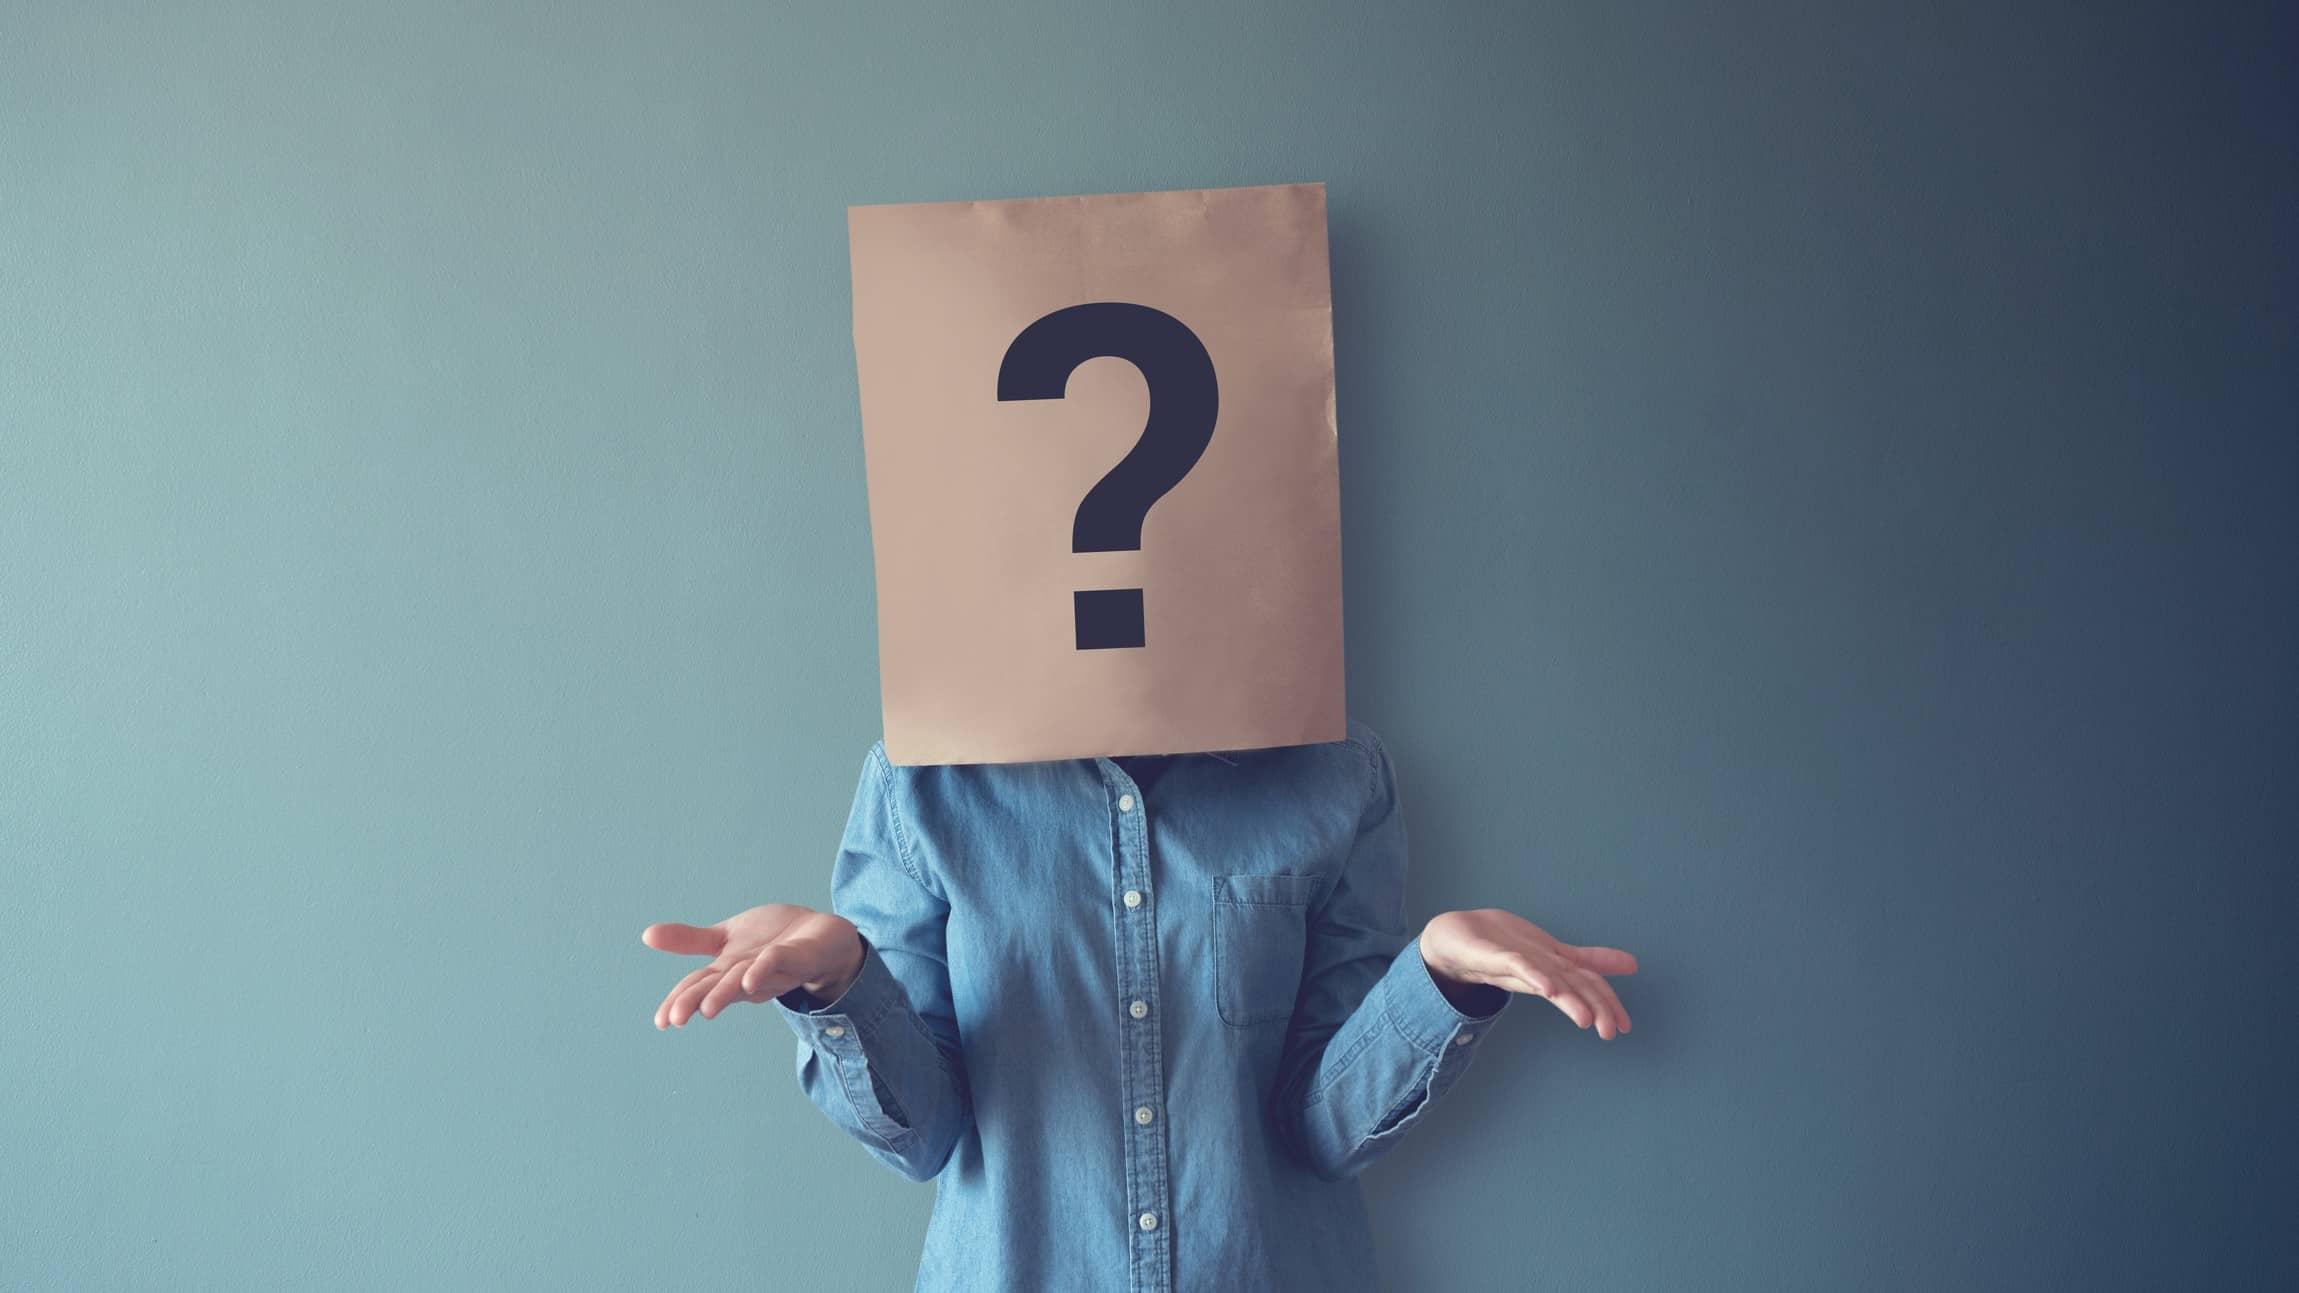 question mark, unsure